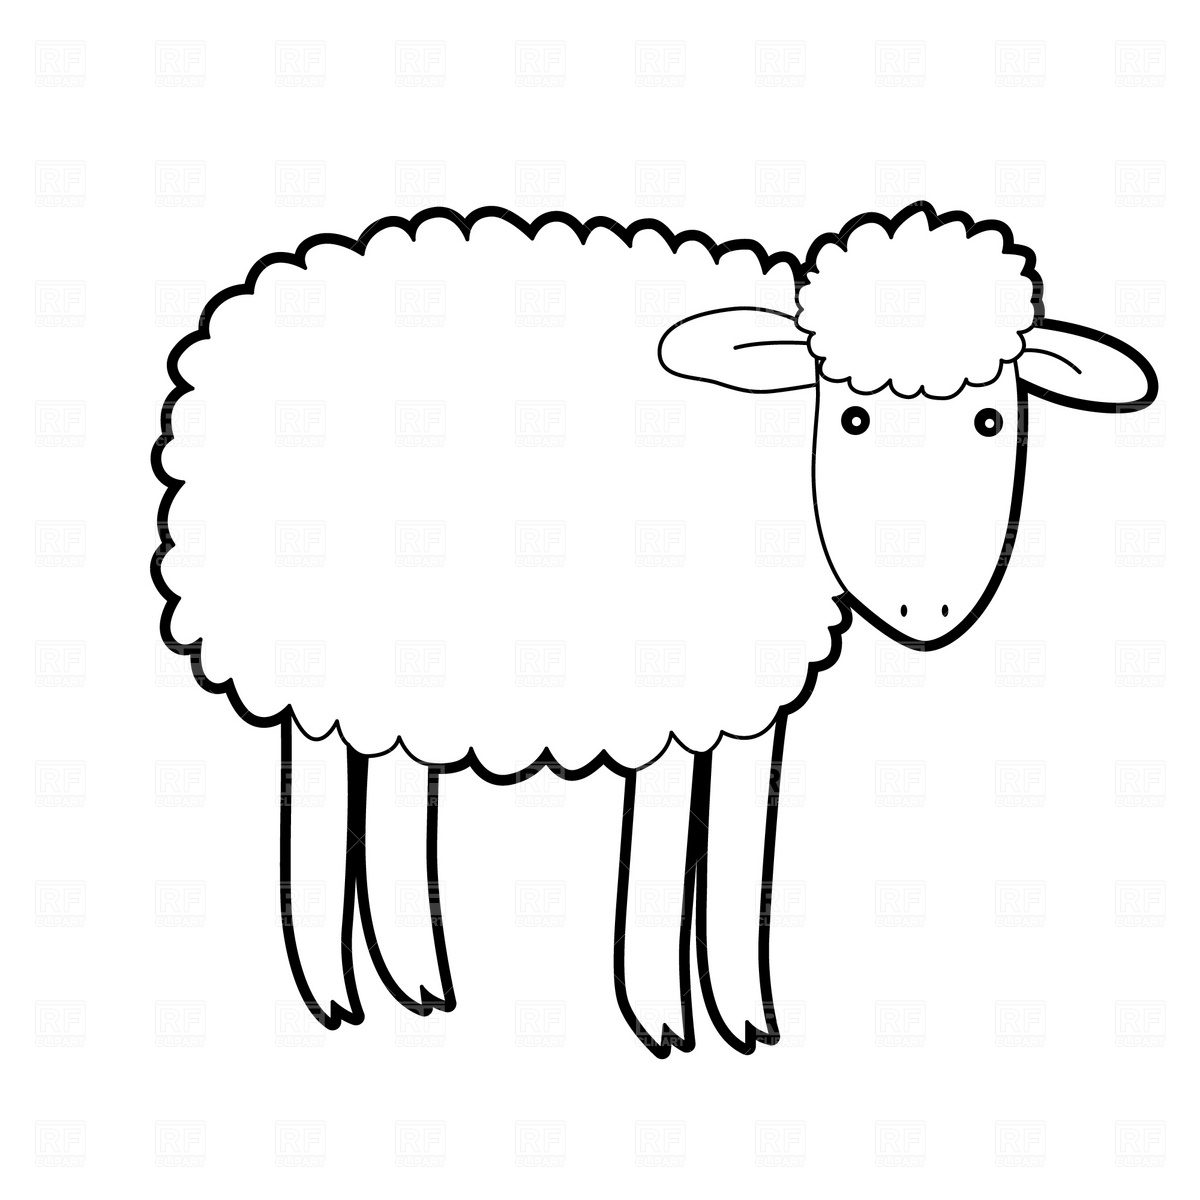 1200x1200 Cartoon Sheep Vector Image Vector Artwork Of Plants And Animals